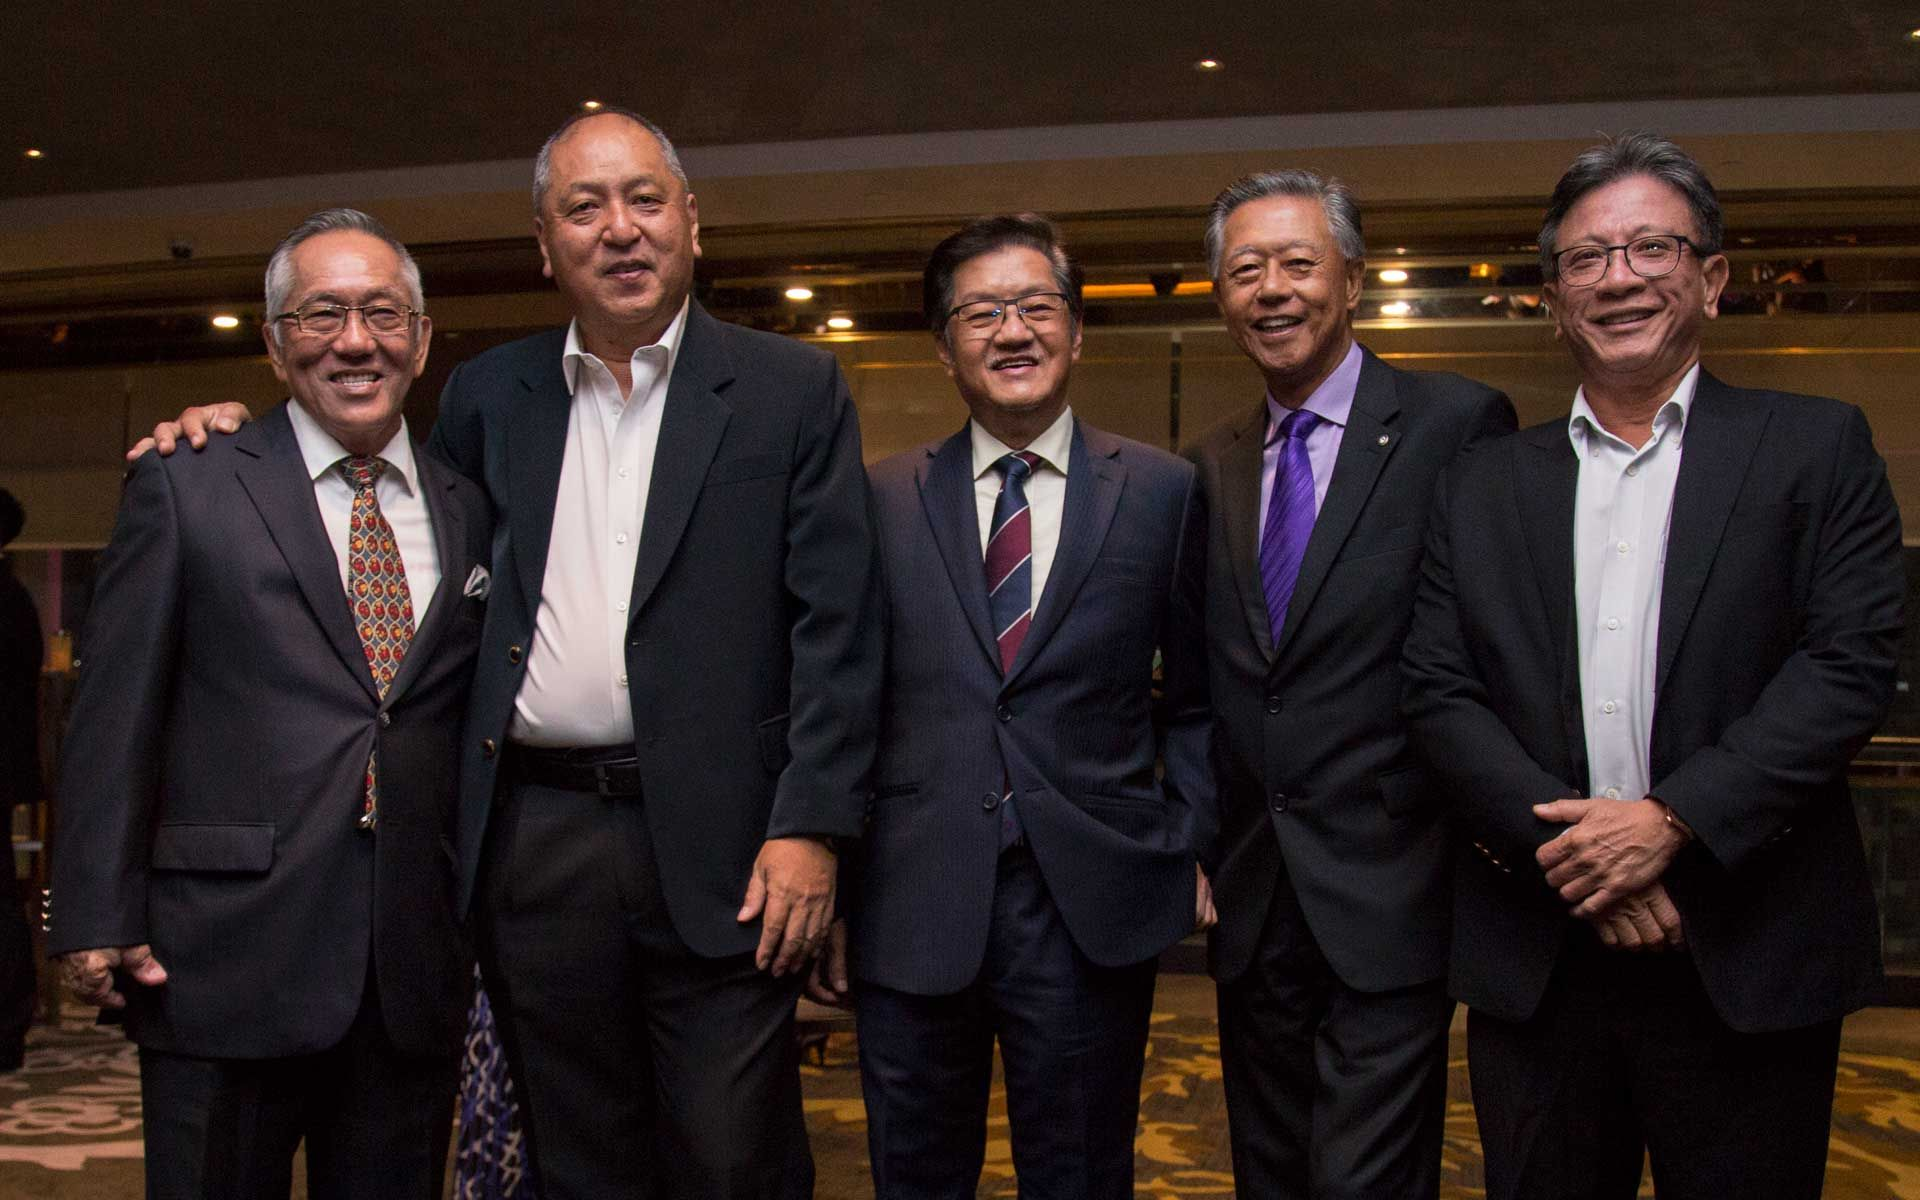 Dato' Sri Yap Teiong Choon, Dato' Kevin Yong, Ivan Tan, Frank Lim and Dato' Dr Steven Tock